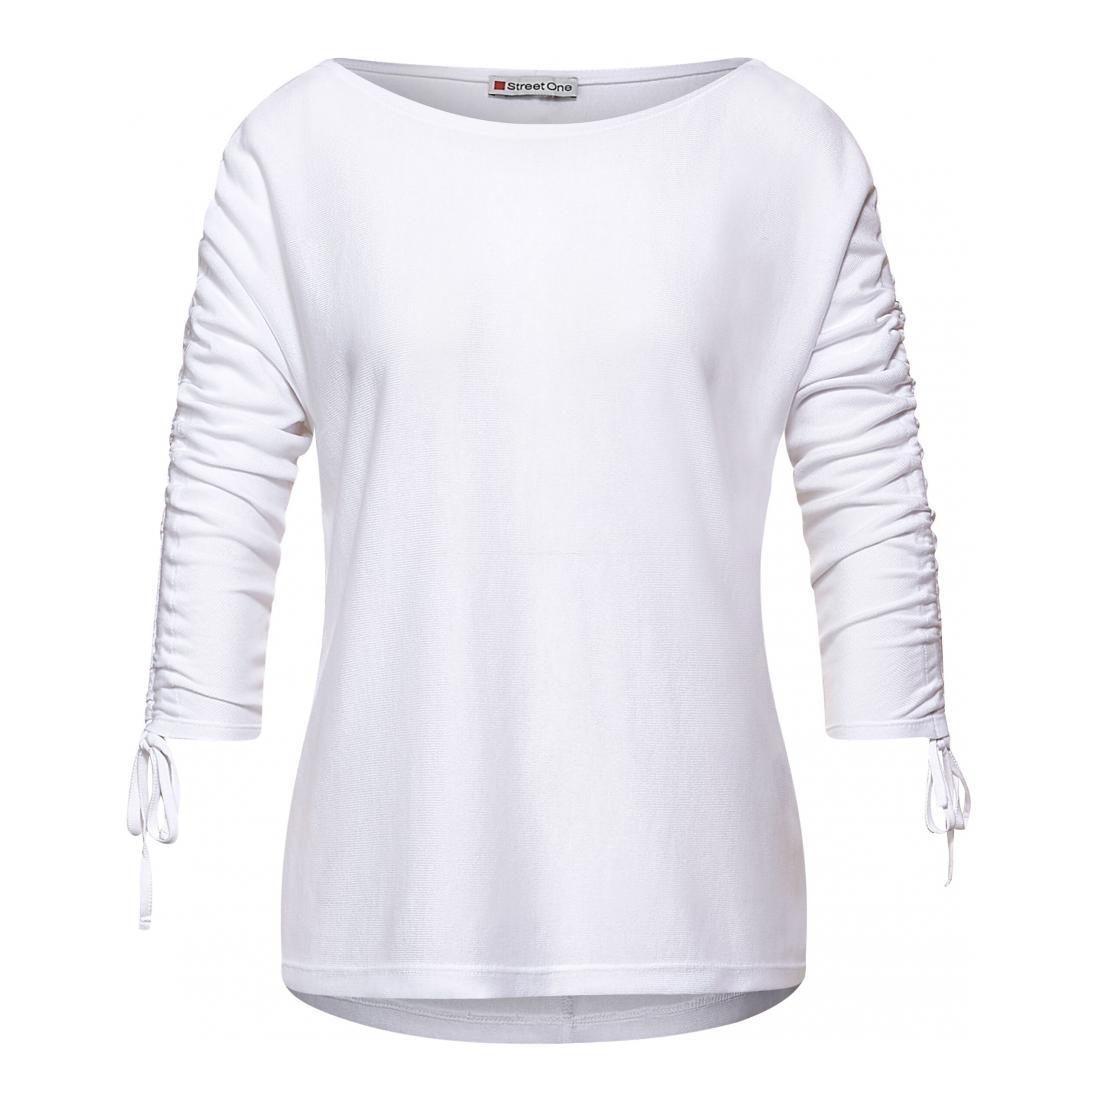 Street One Longsleeves Damen LTD QR batwing shirt w.dr